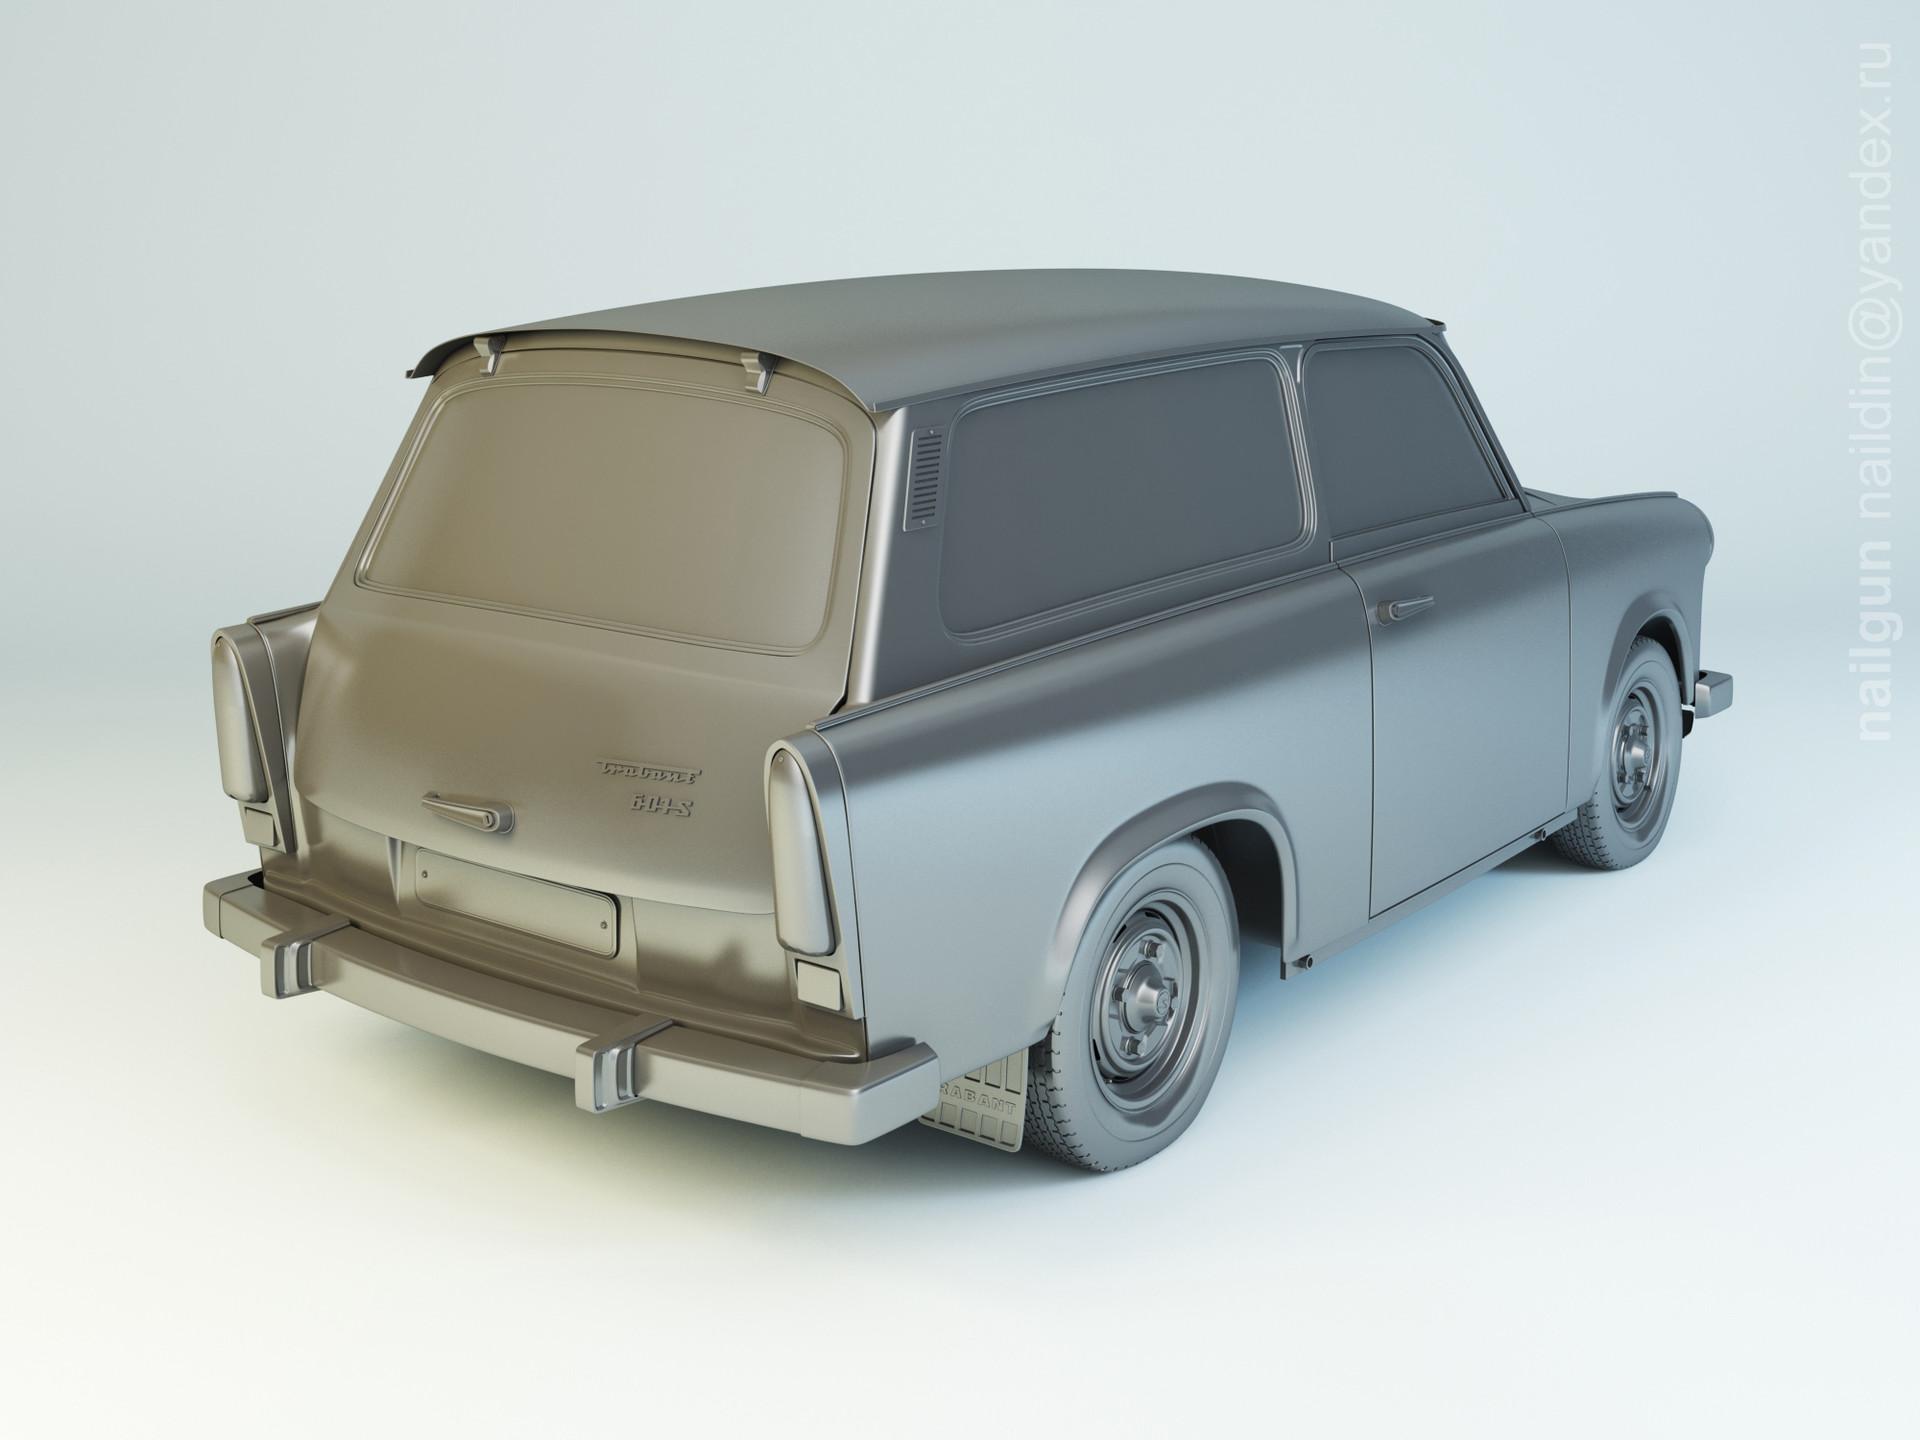 Nail khusnutdinov pwc 023 004 trabant 601 combi modelling 1